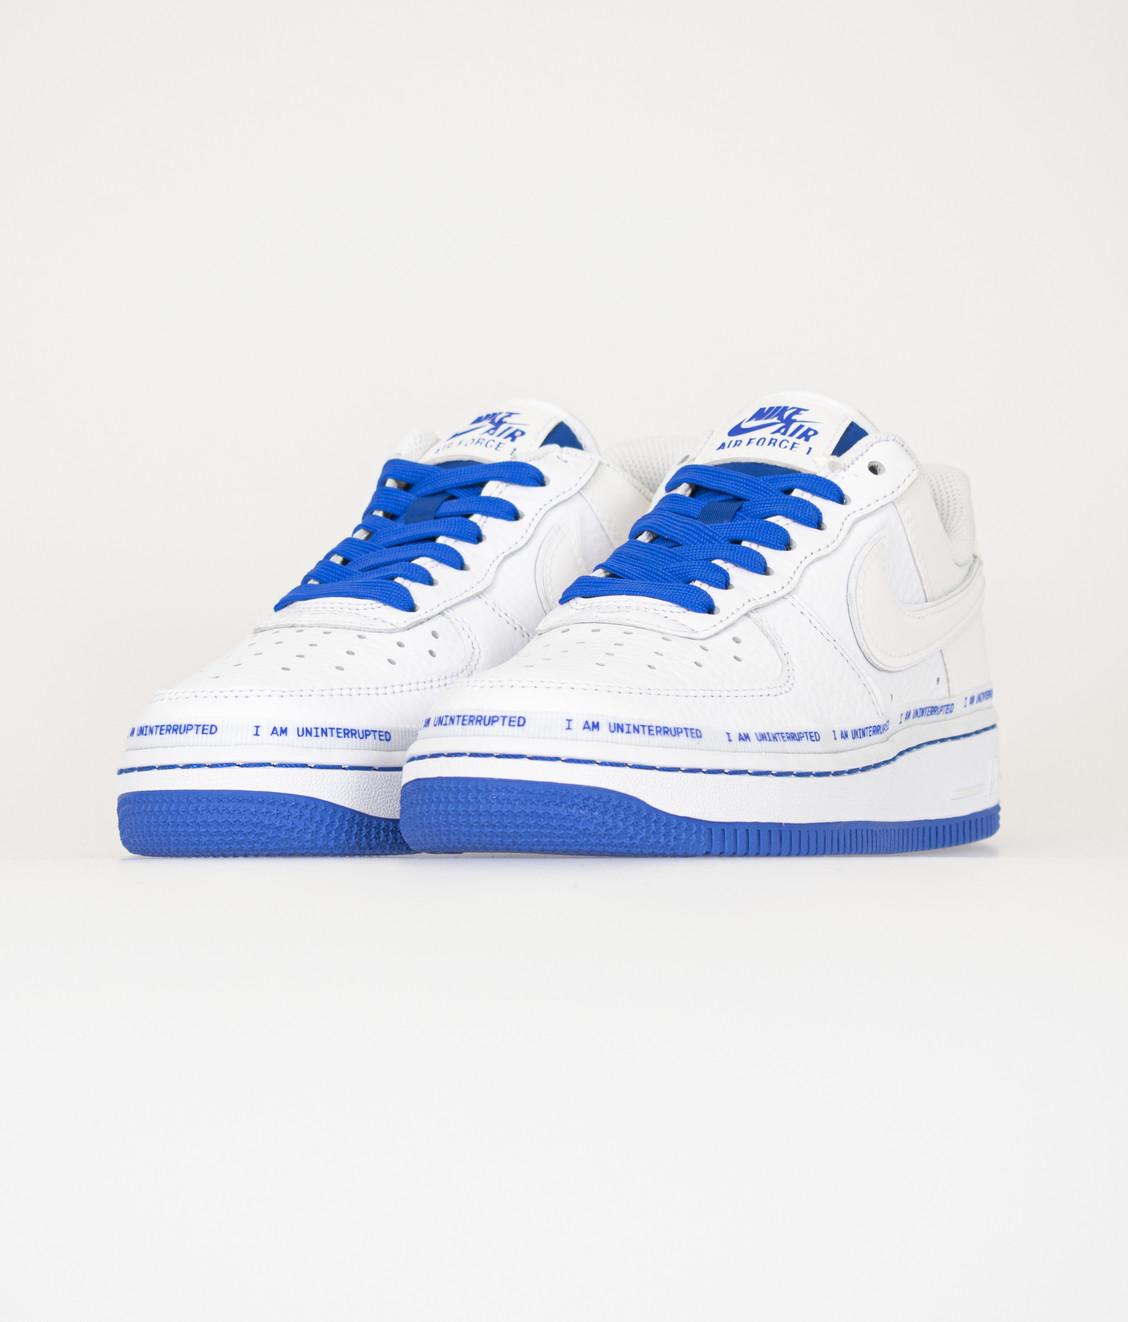 Nike Nike x Uninterrupted Air Force 1 '07 MTAA QS